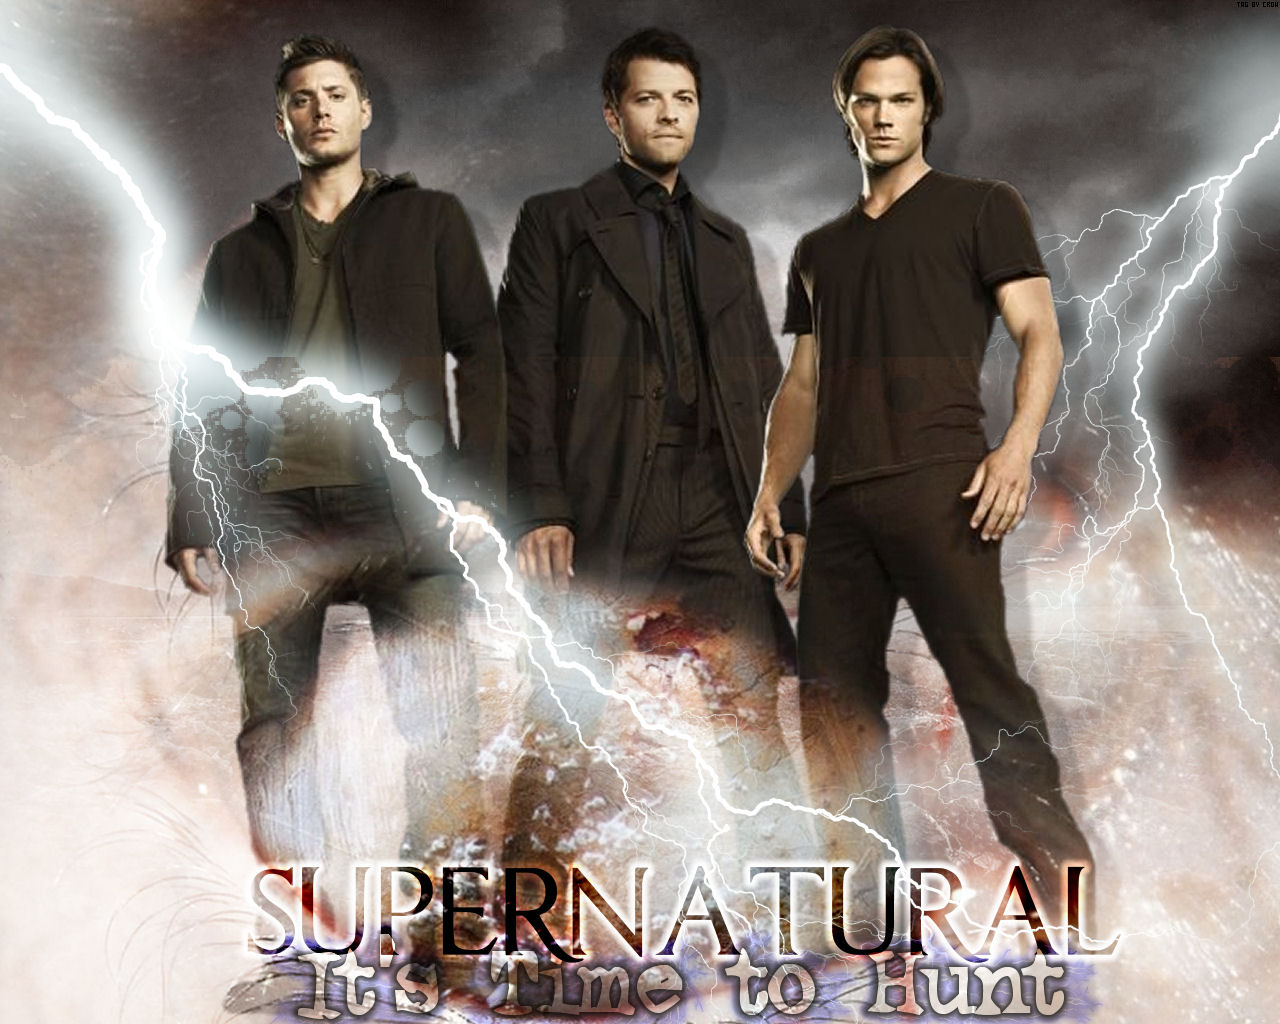 Supernatural Wallpaper Supernatural Wallpaper 30505255